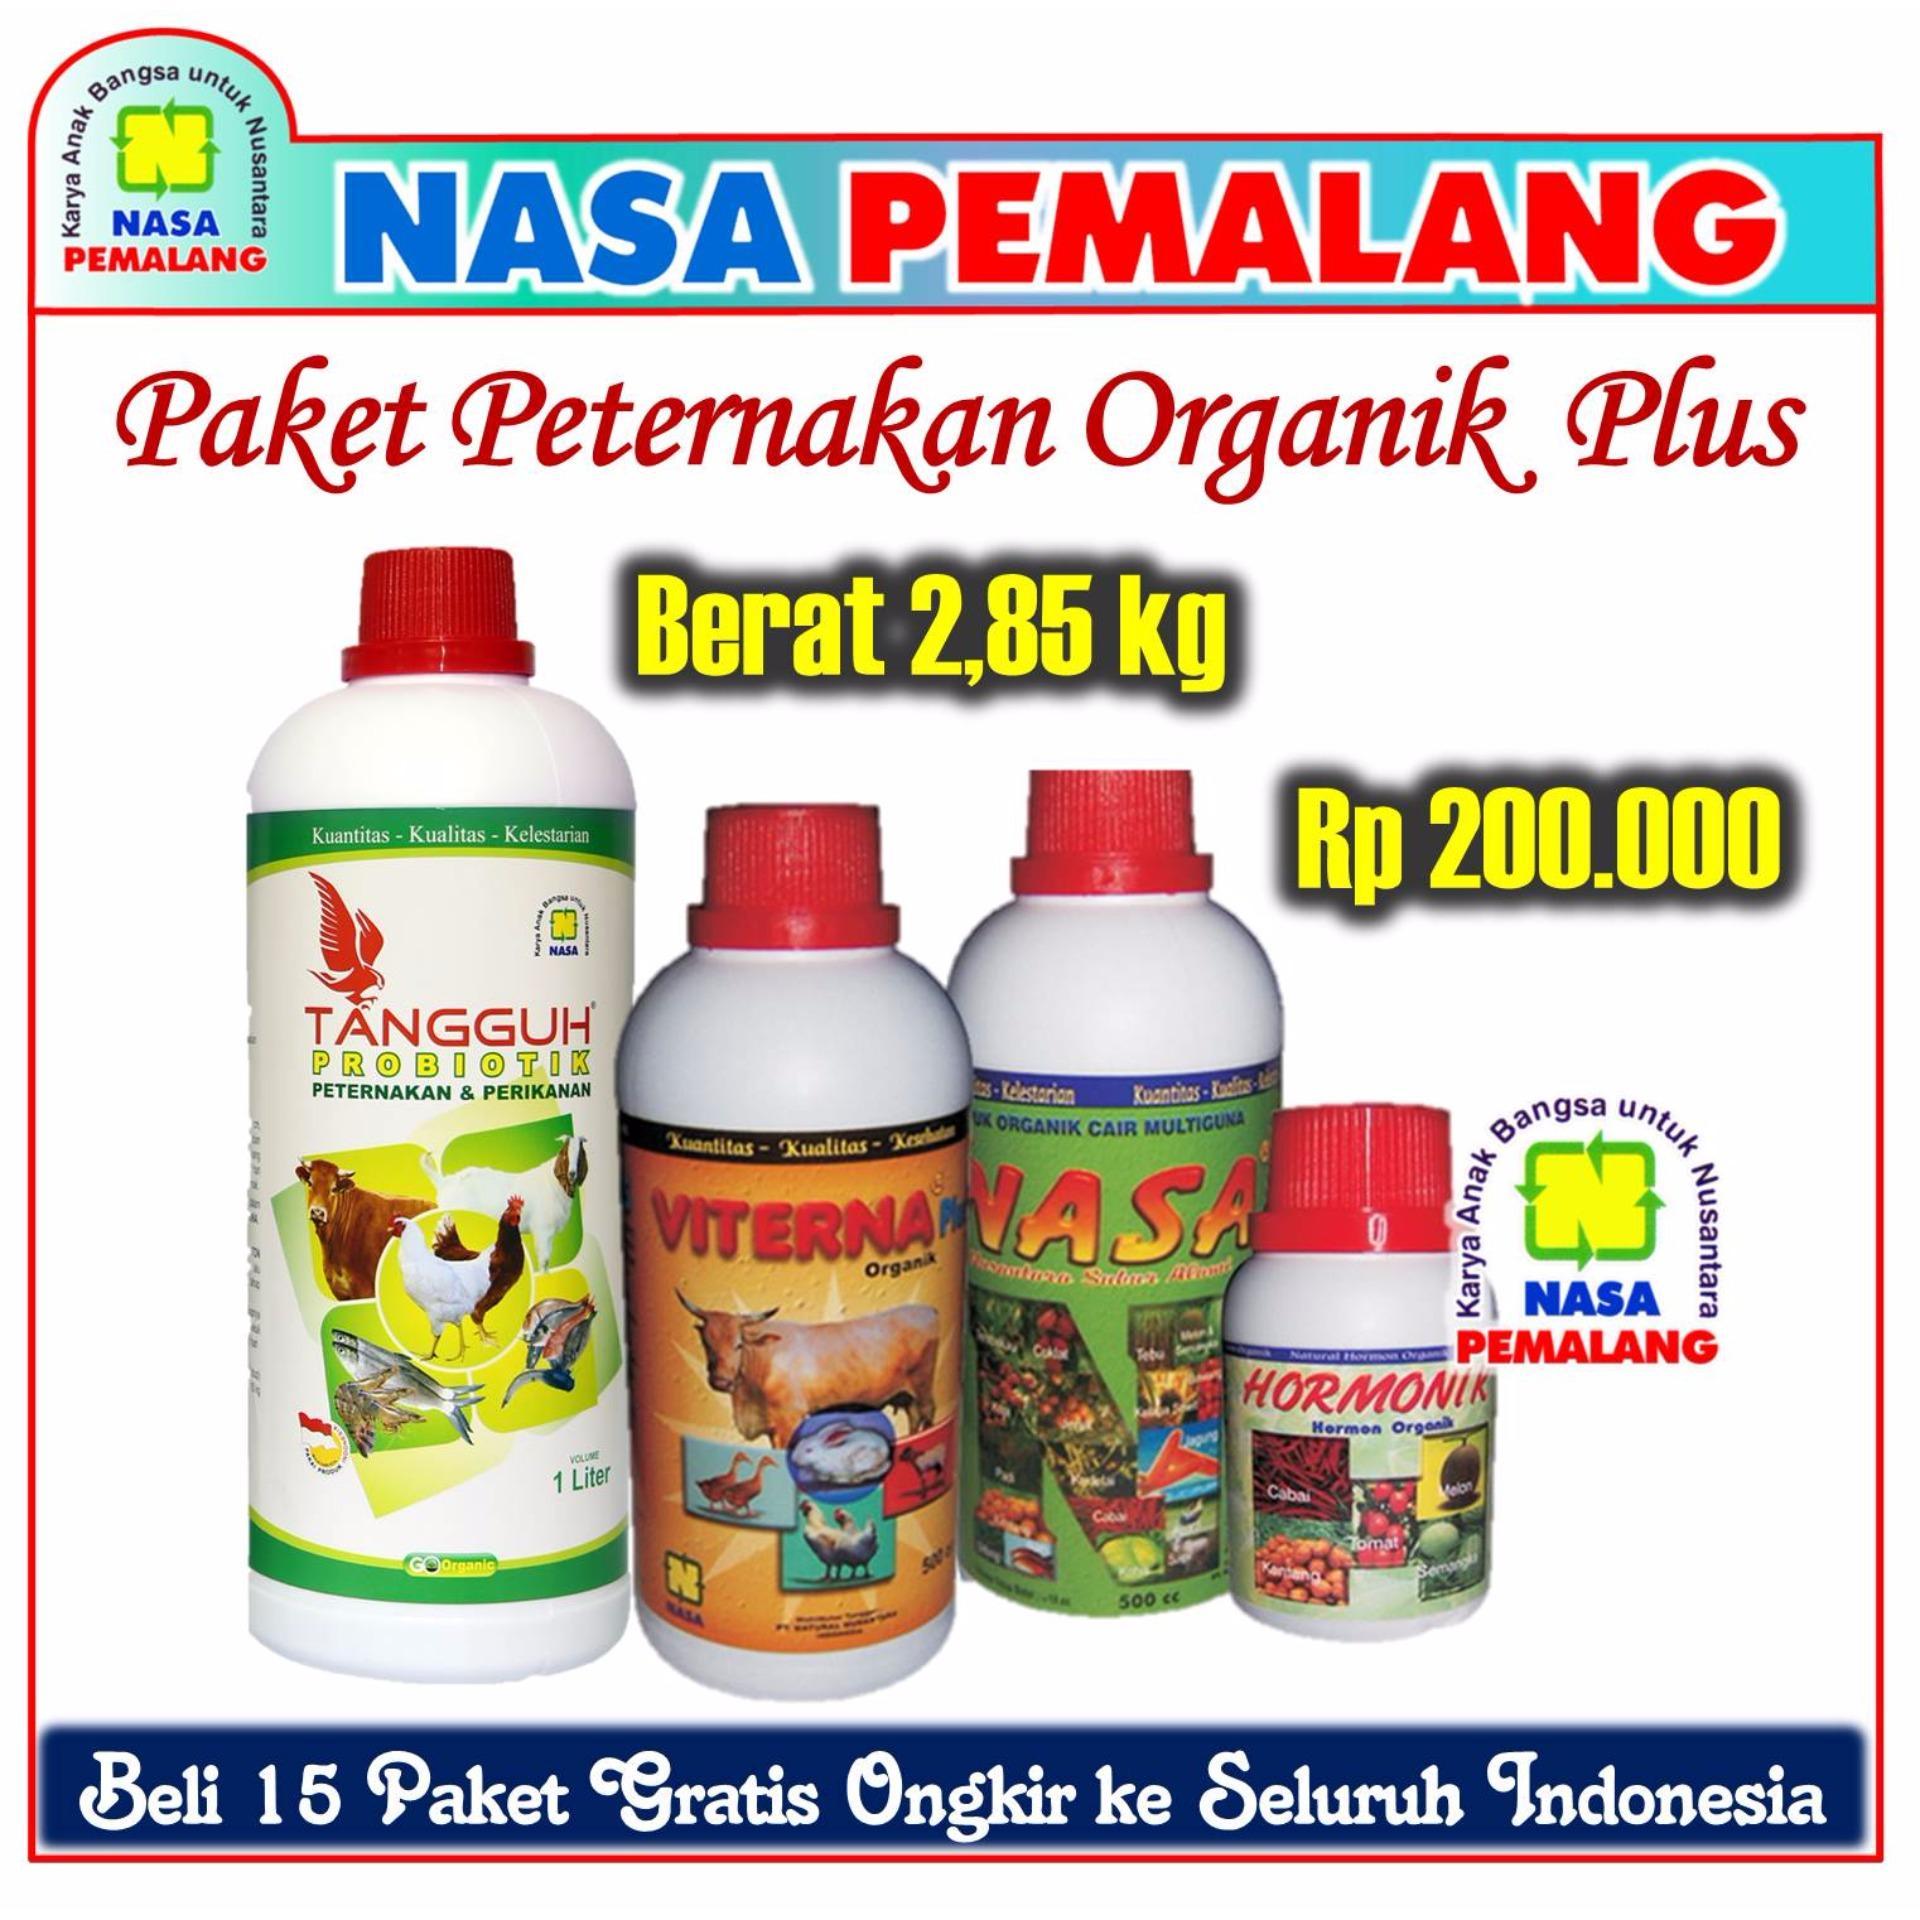 Ulasan Paket Peternakan Organik Nasa Plus Tangguh Viterna Pocnasa Hormonik